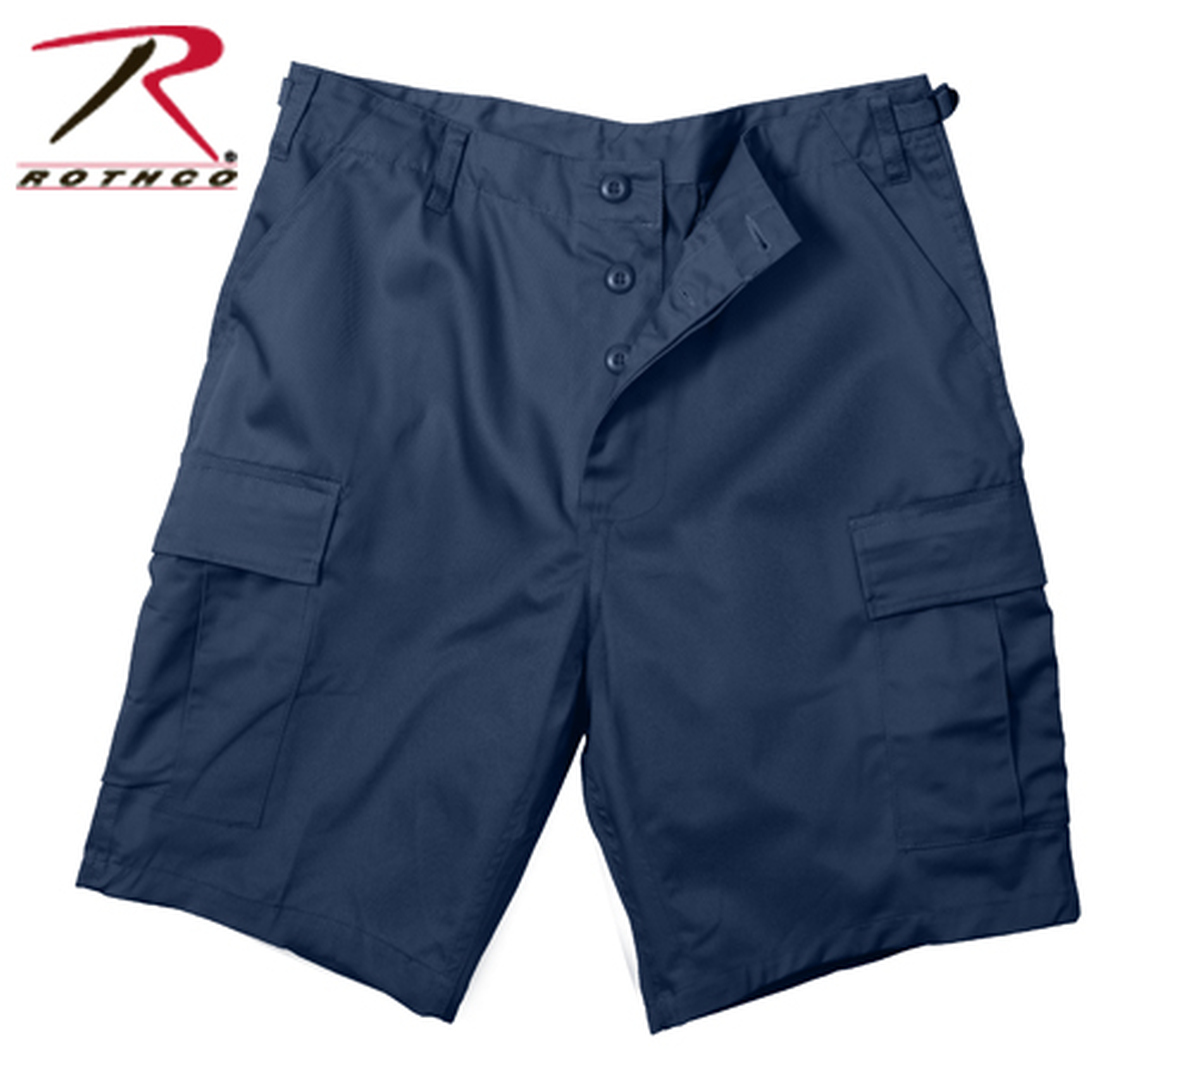 Big & Tall Shorts